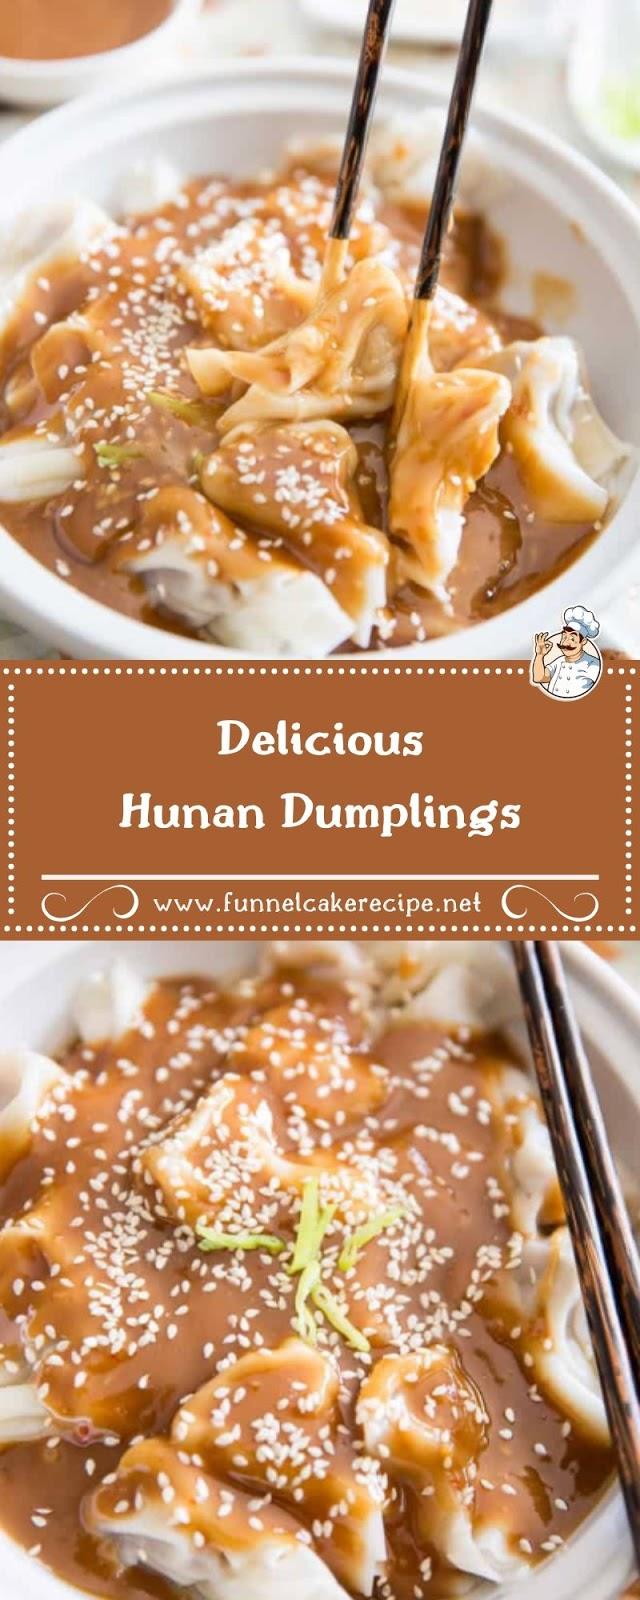 Delicious Hunan Dumplings